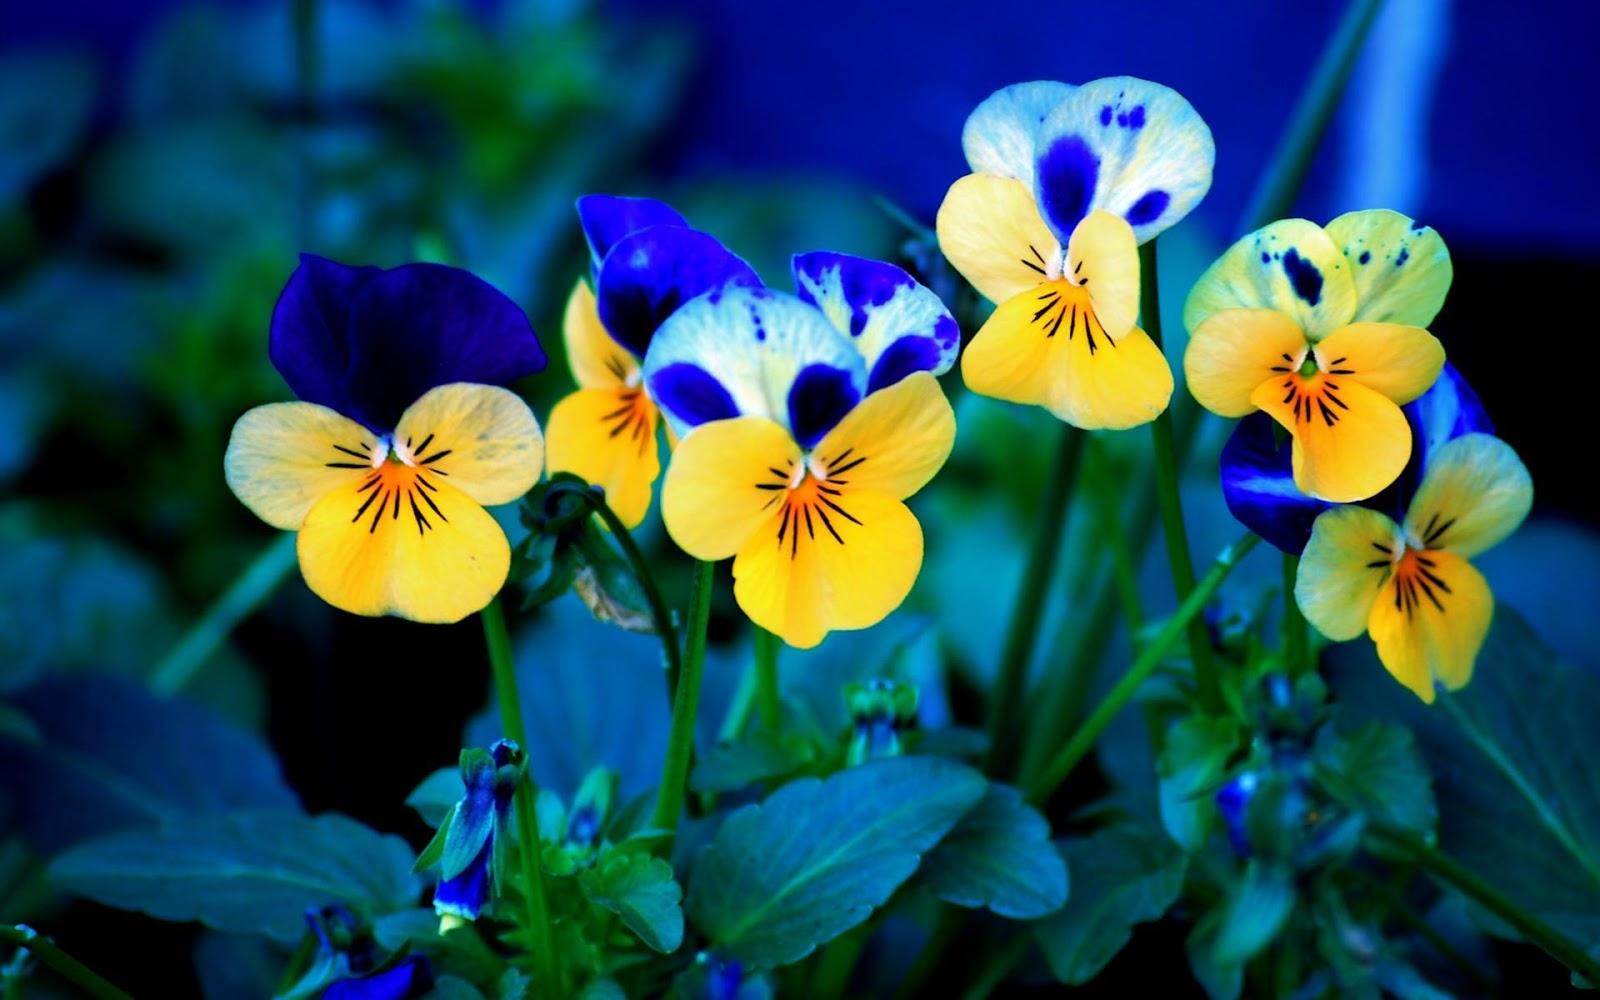 http://1.bp.blogspot.com/-SCz1WhbXjZo/UWzMXzVpKiI/AAAAAAAAAks/ZdMOU-tjWp0/s1600/viola-pansee-bluers-flowers-hd-wallpaper.jpg